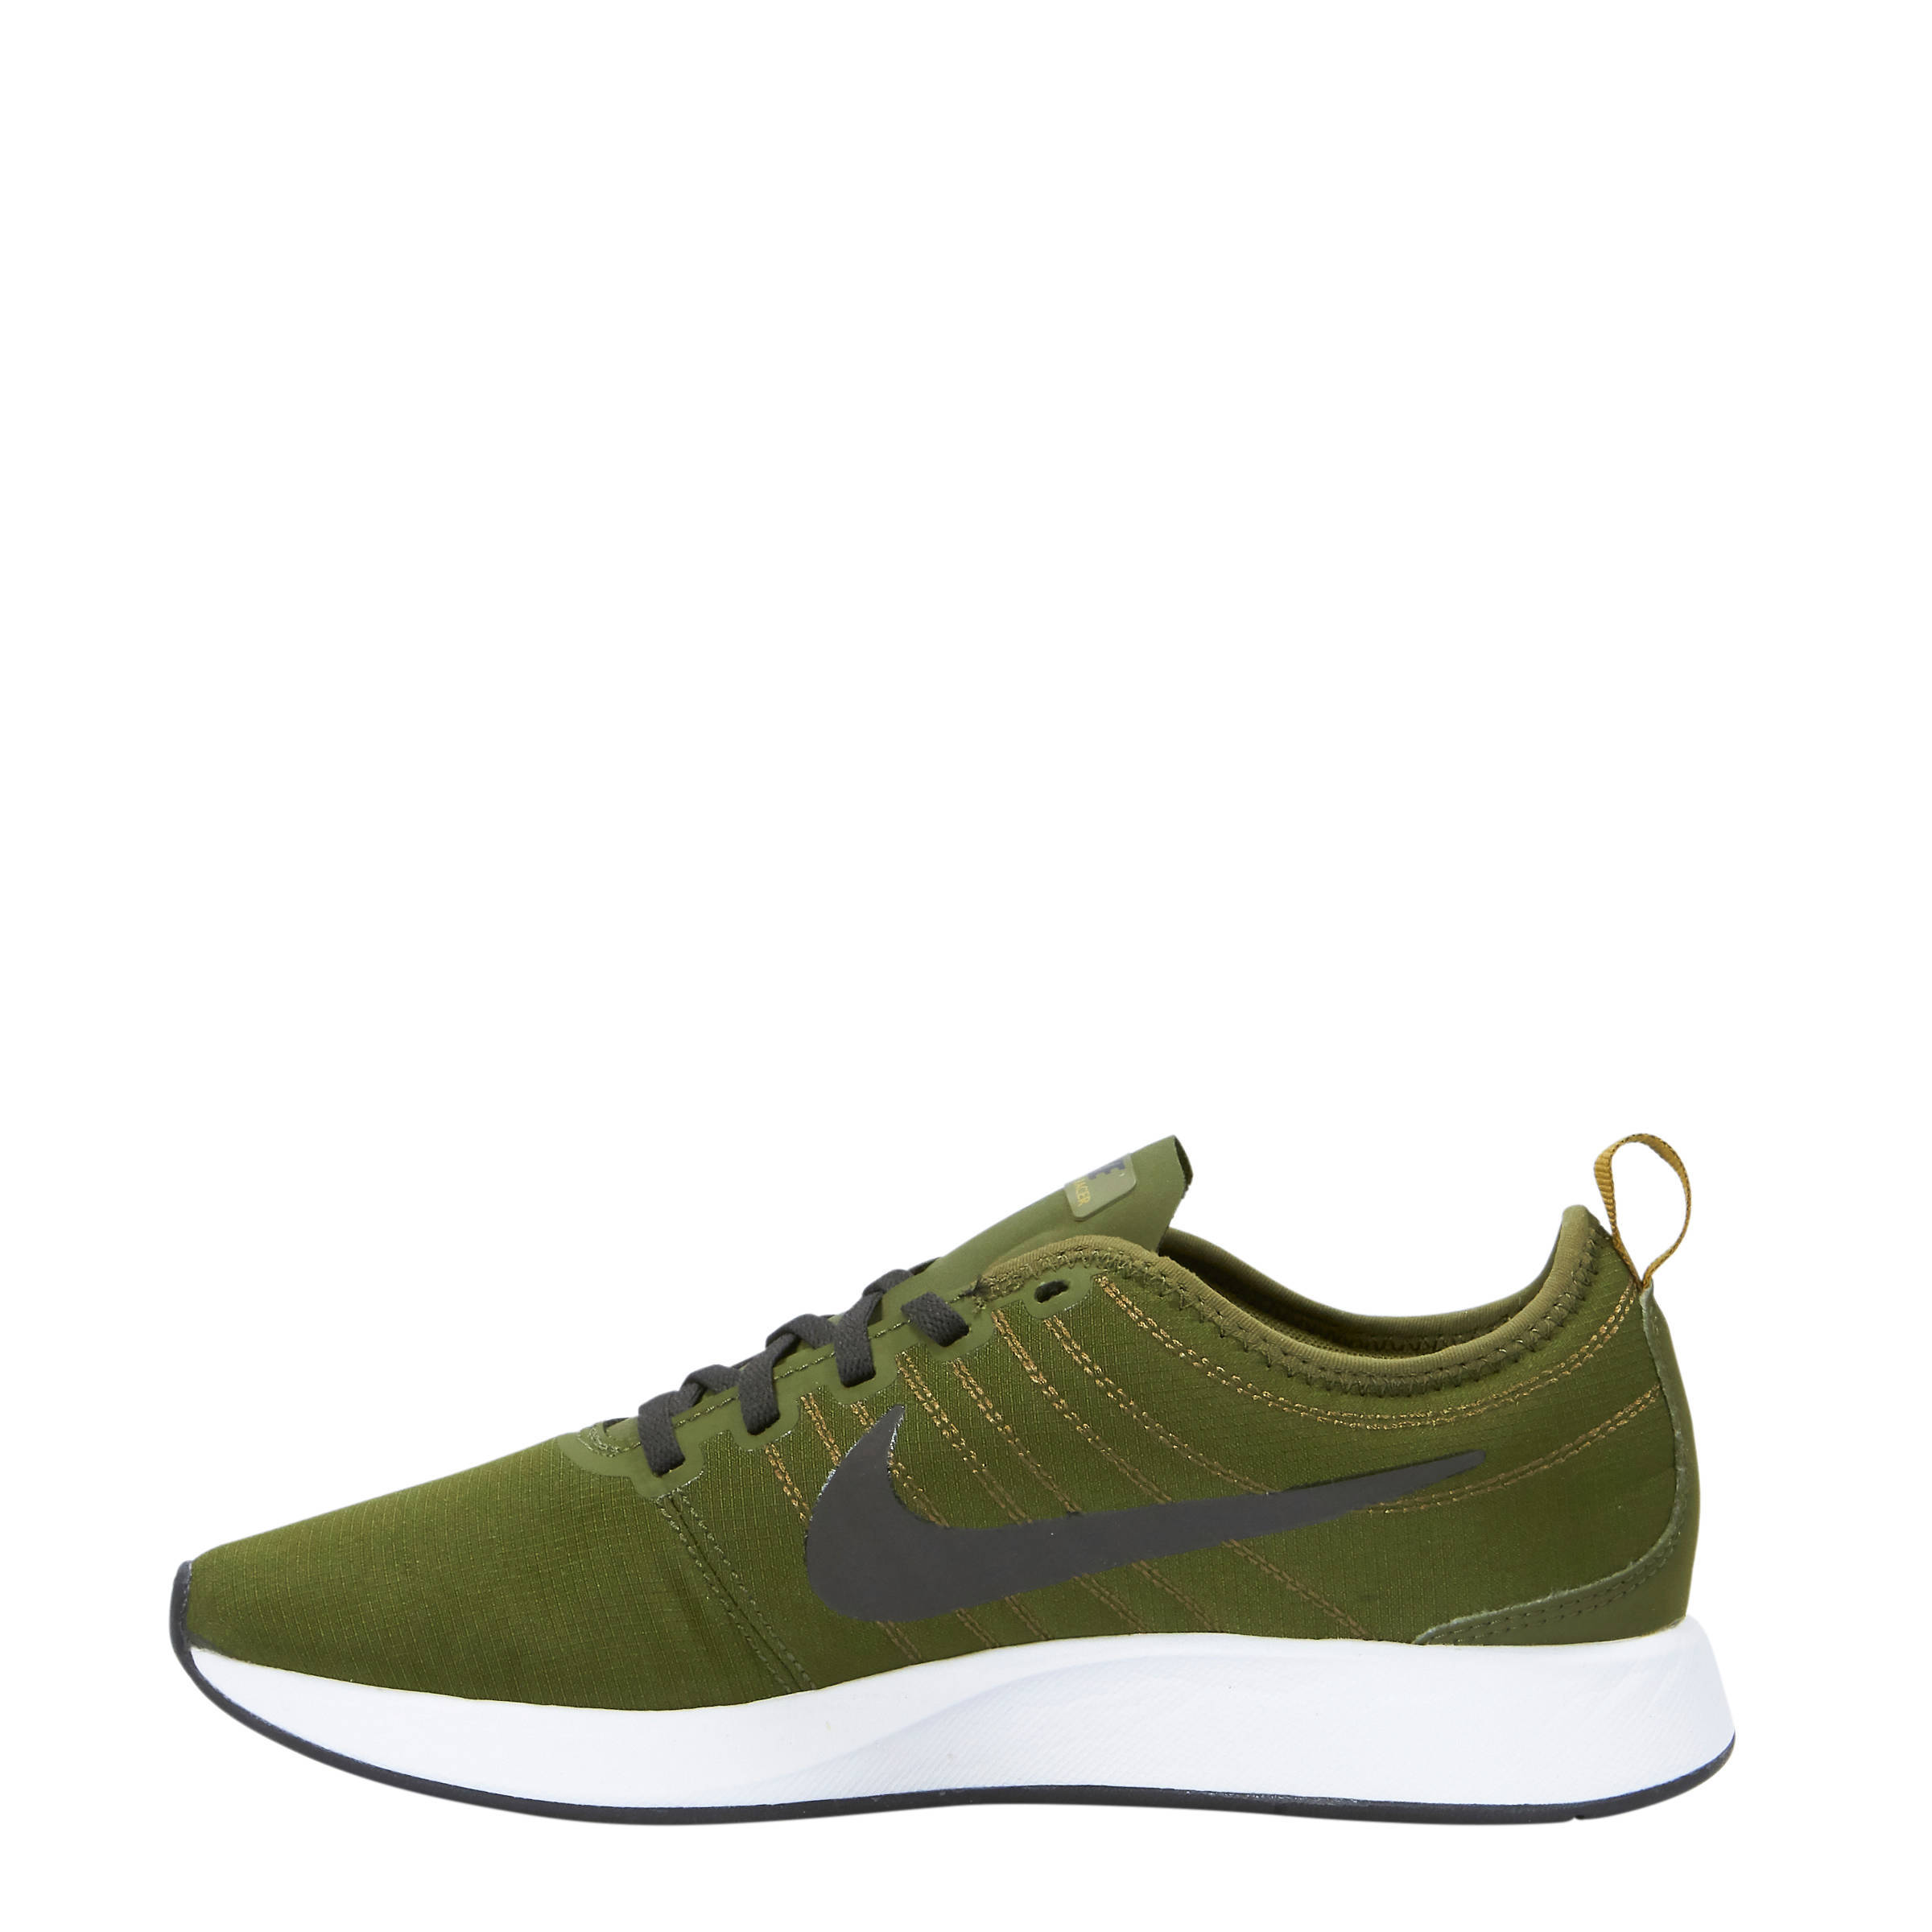 Nike Dualtone Racer schoenen olijf groen Heren Nike